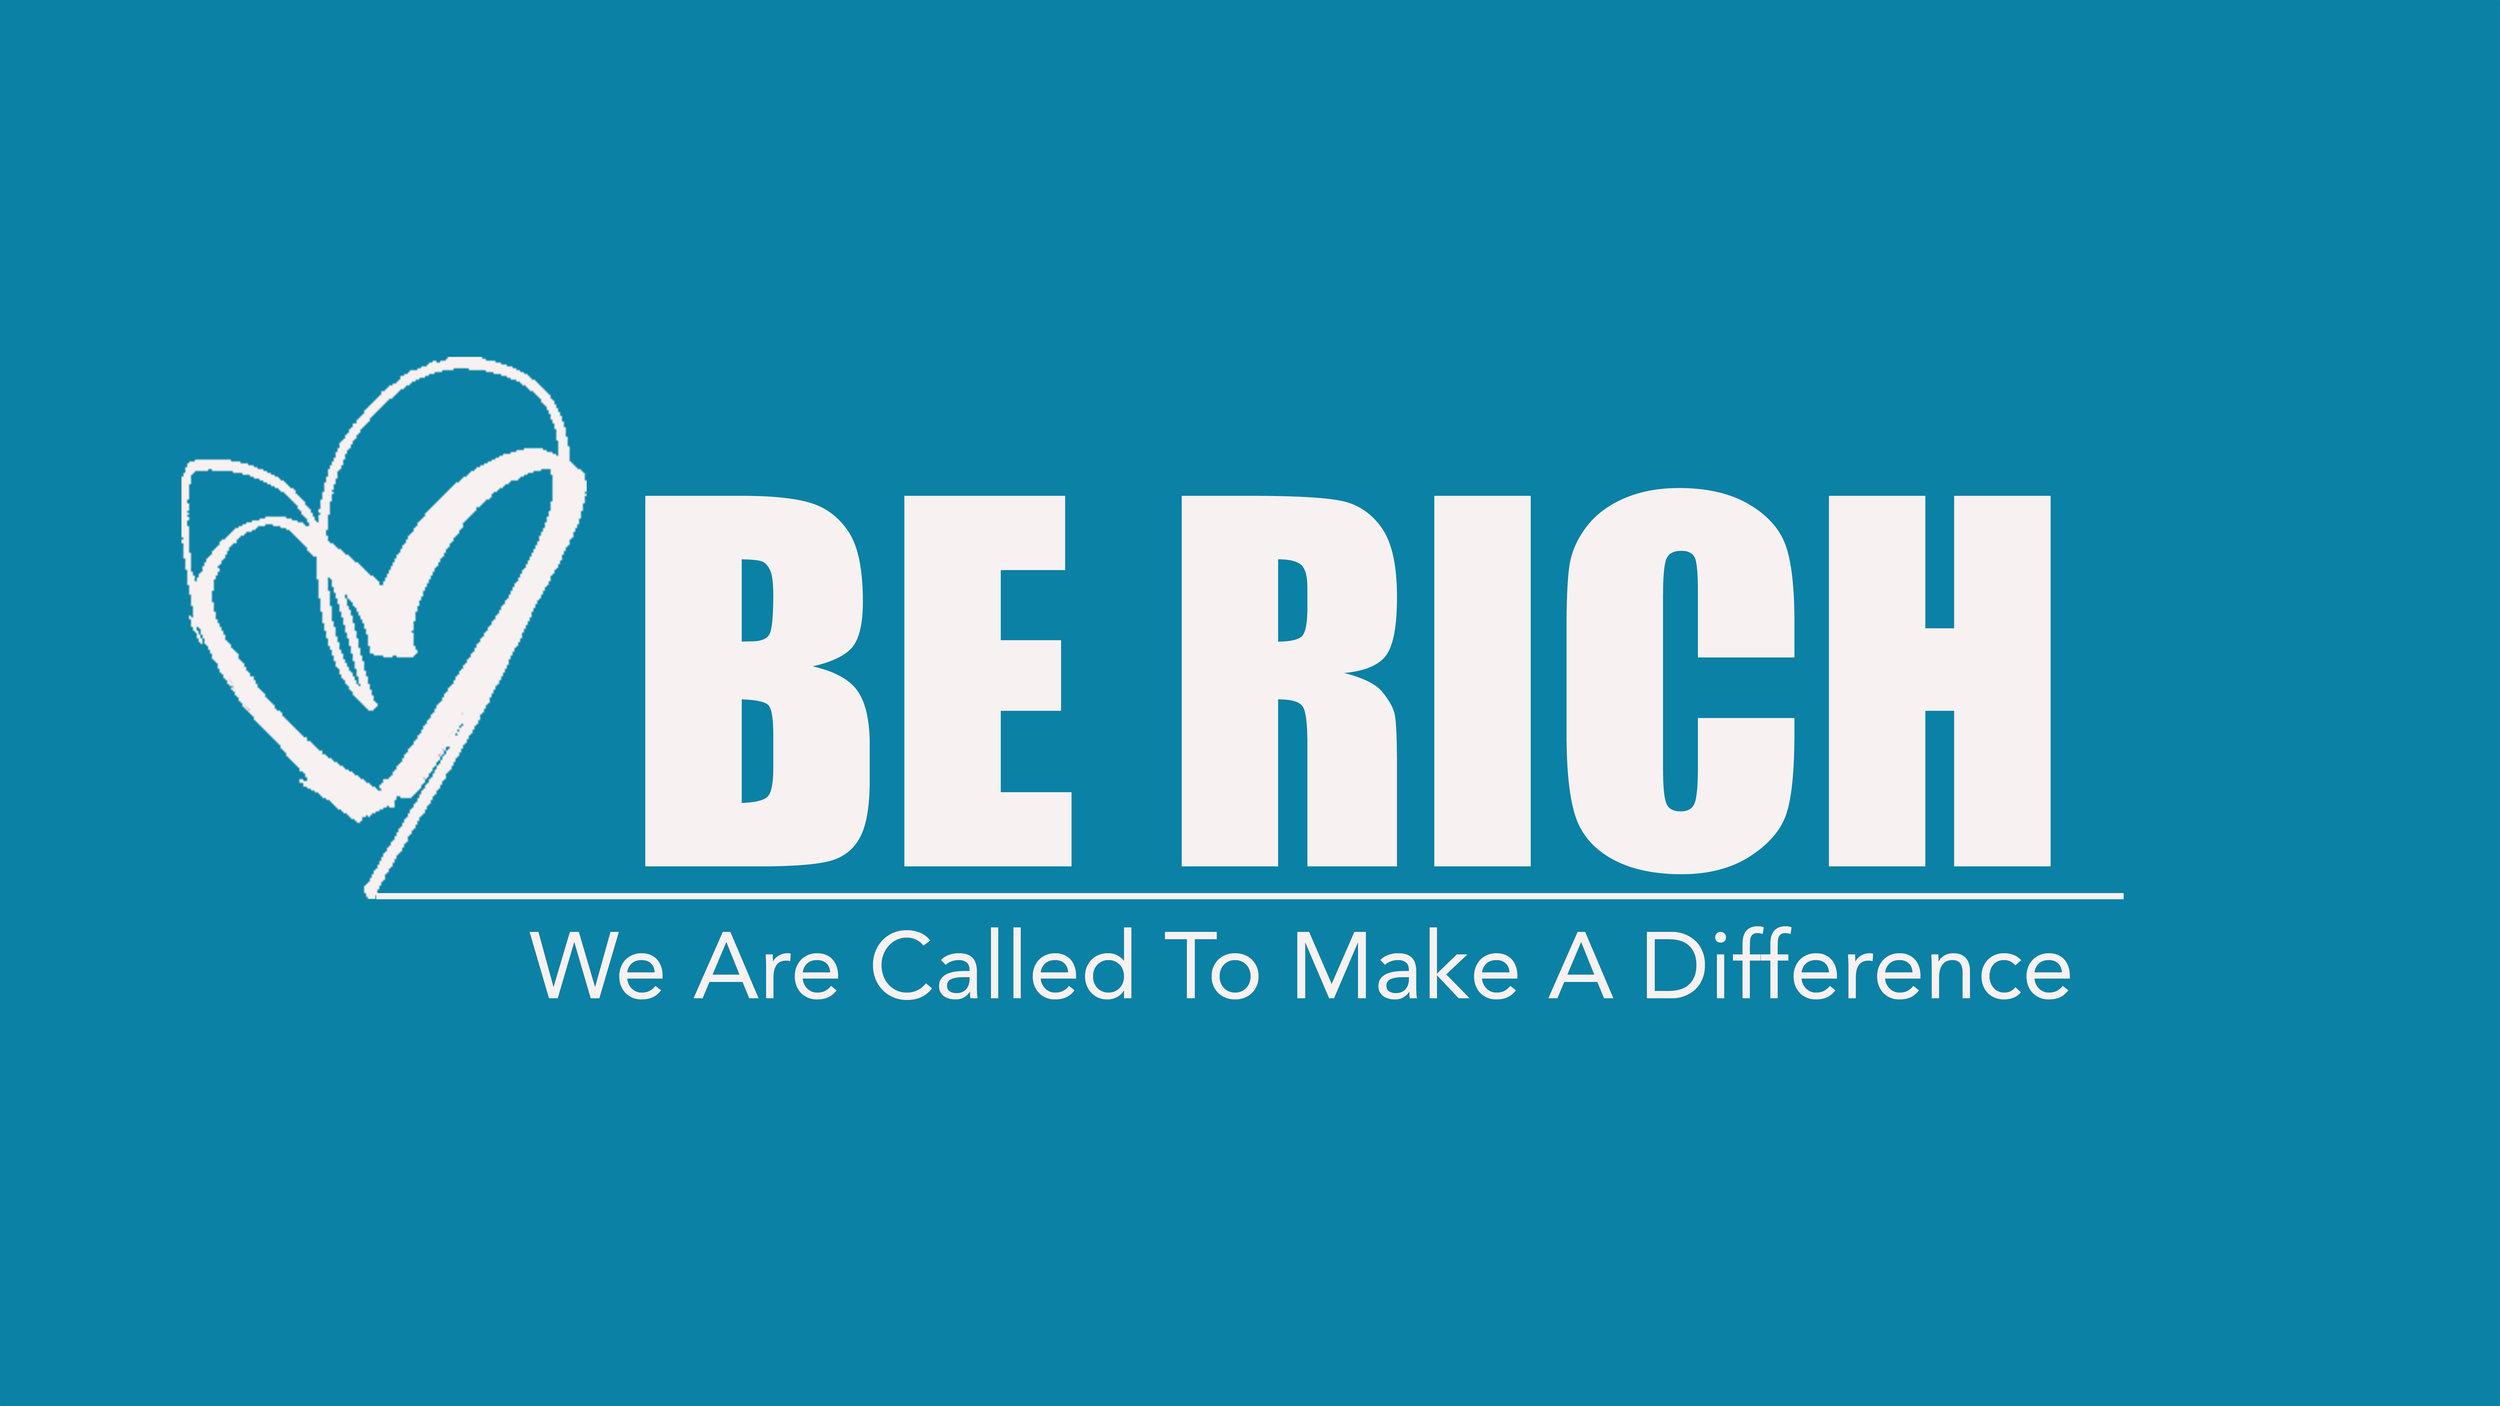 Be_Rich_300.jpg